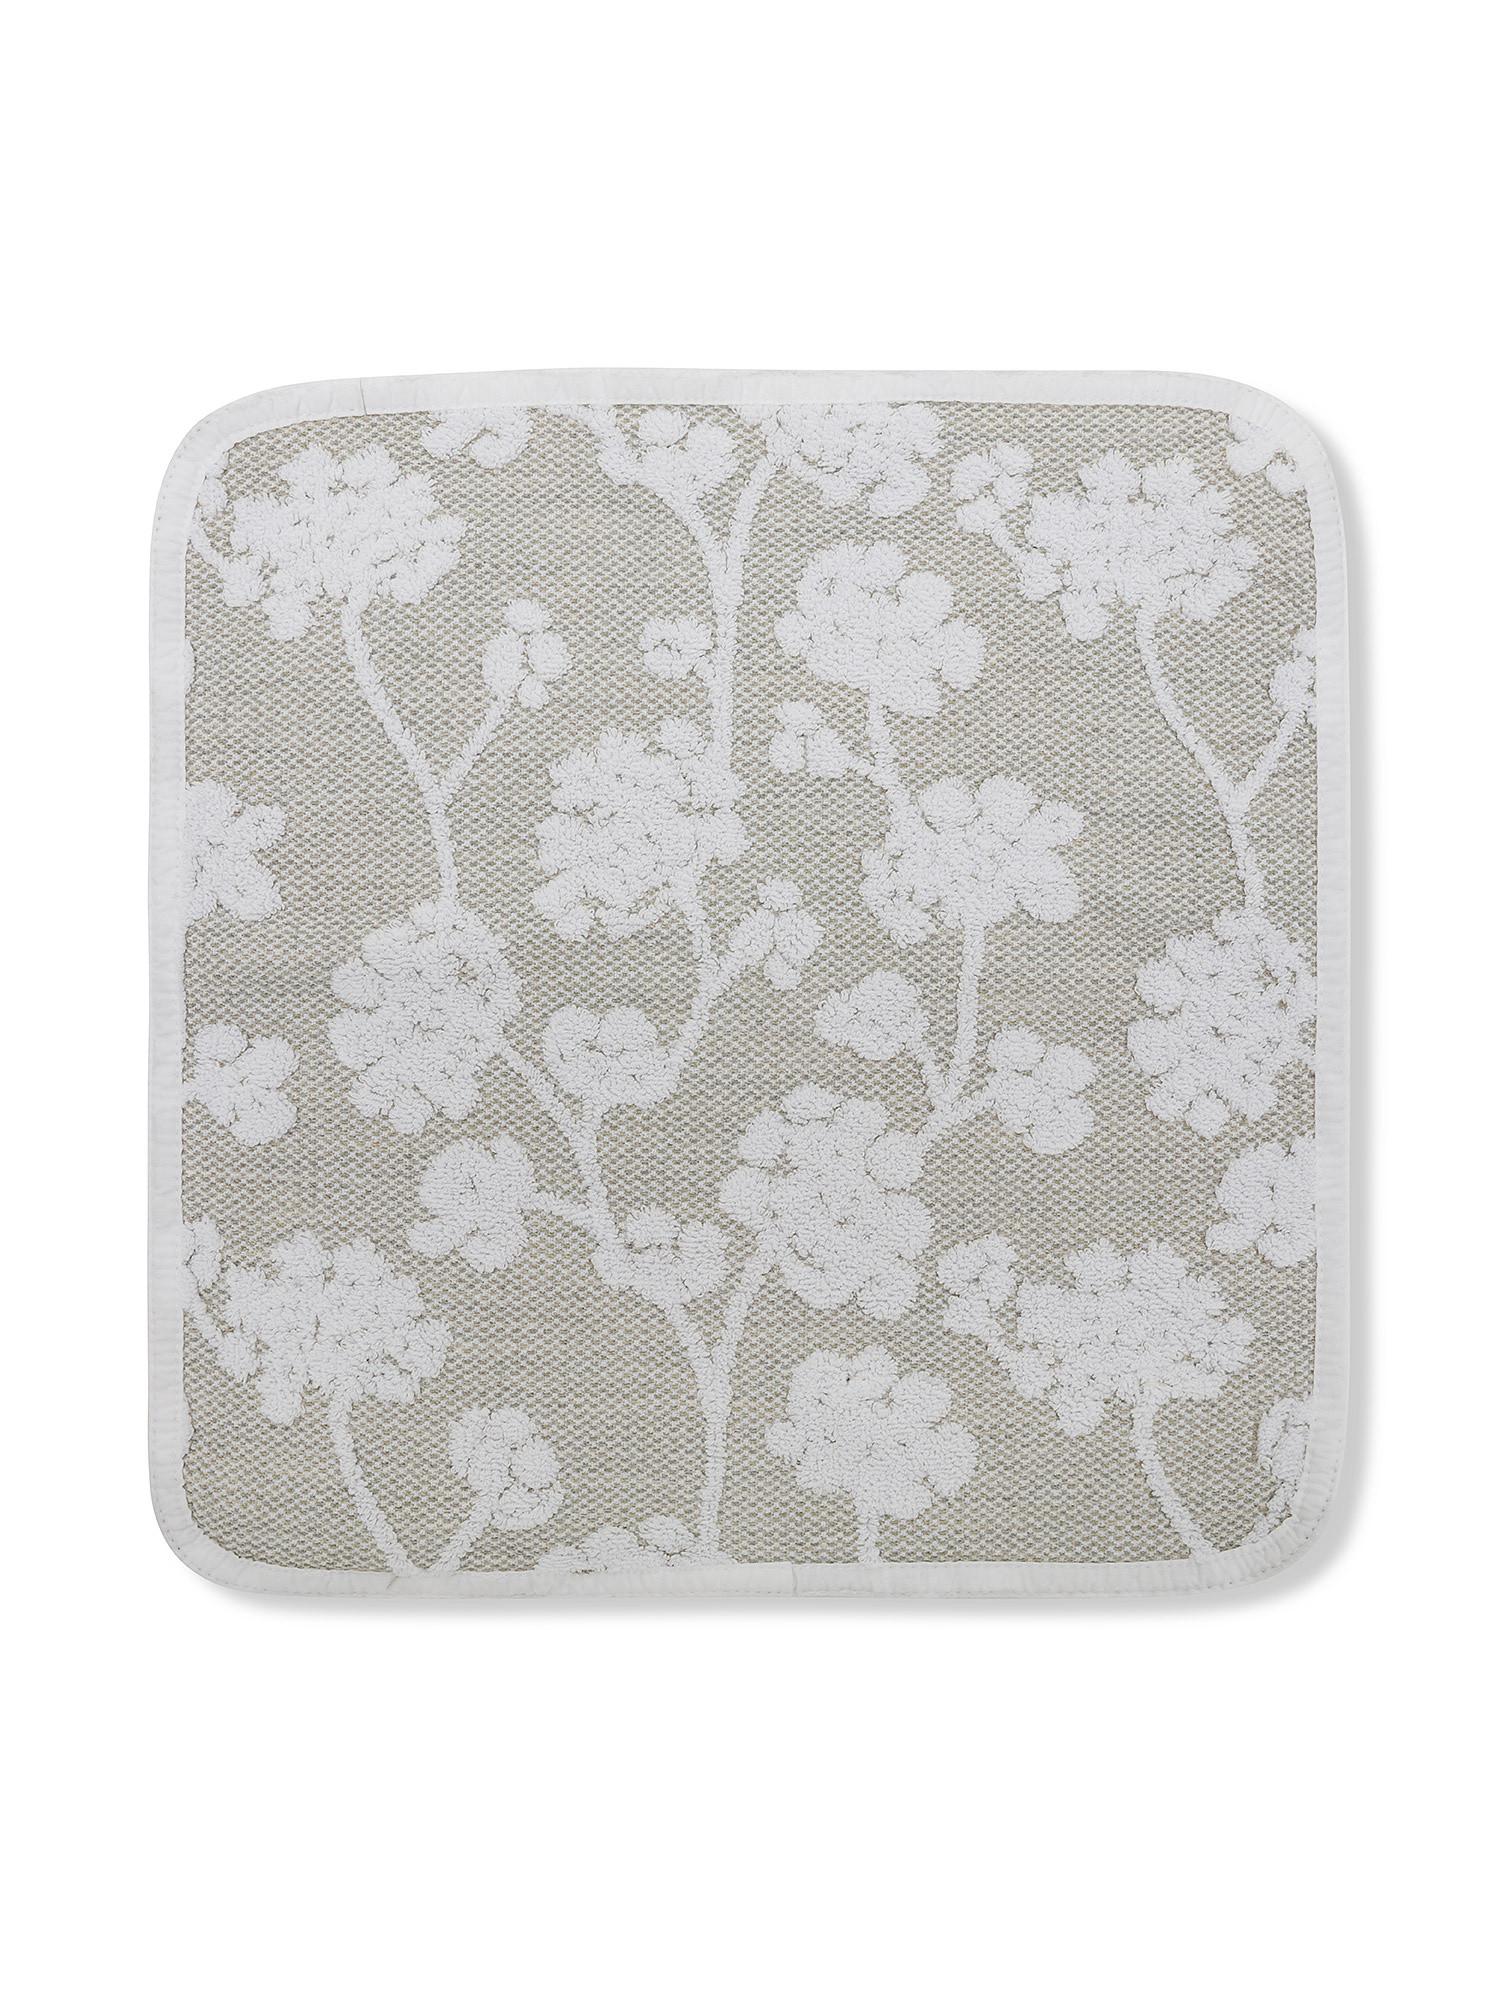 Asciugamano puro cotone a fiori Thermae, Beige chiaro, large image number 0